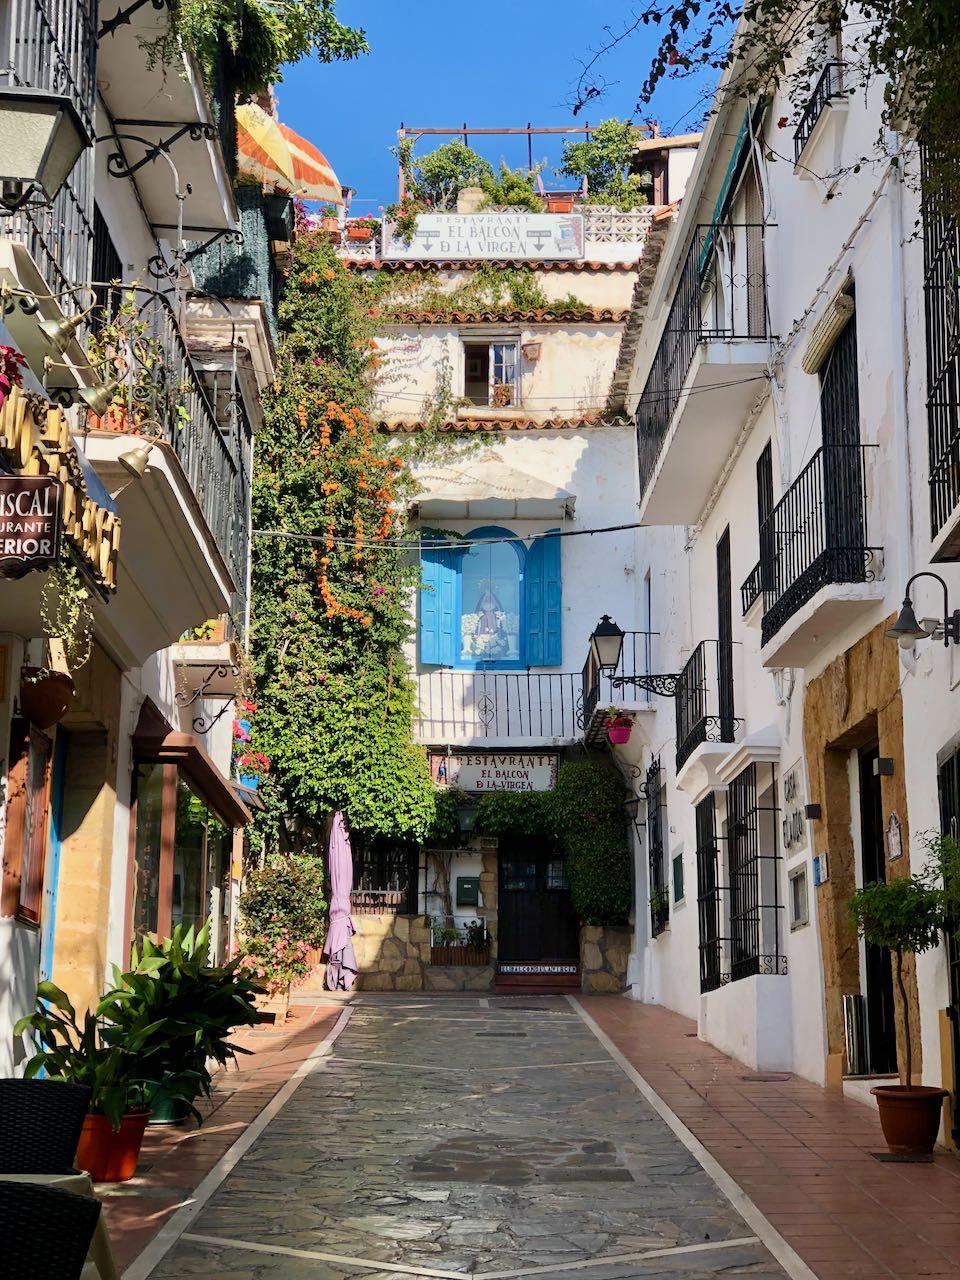 visiter l'andalousie